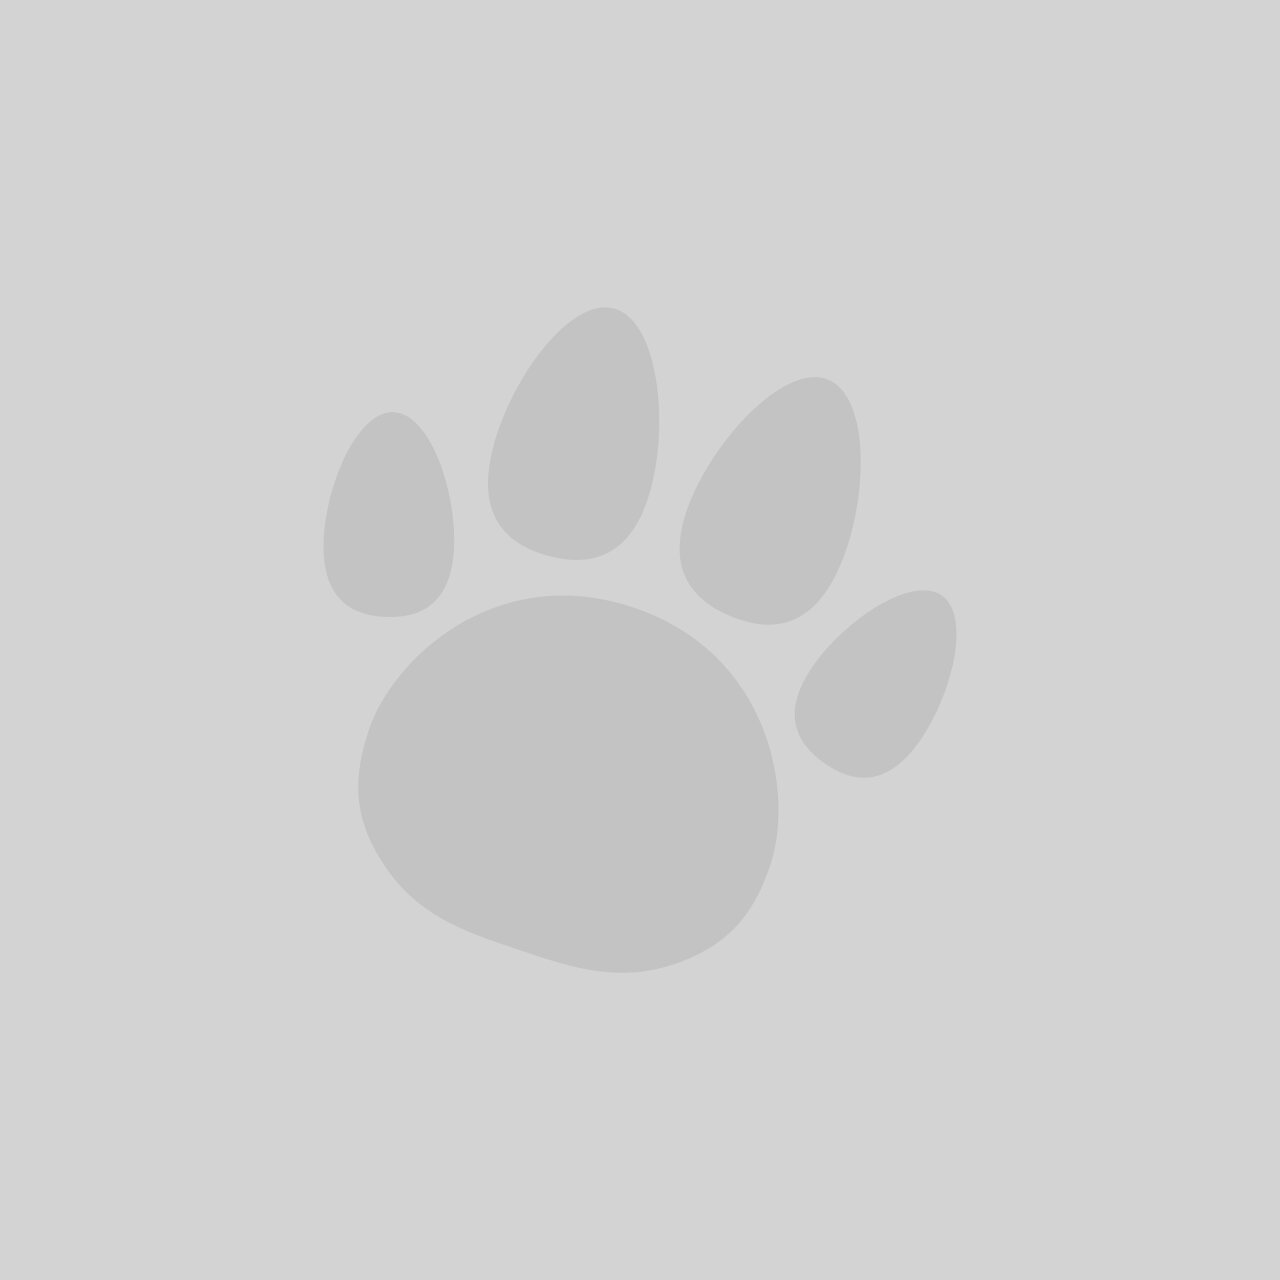 Johnsons 4Fleas Spot On Dual Action for Medium Dogs